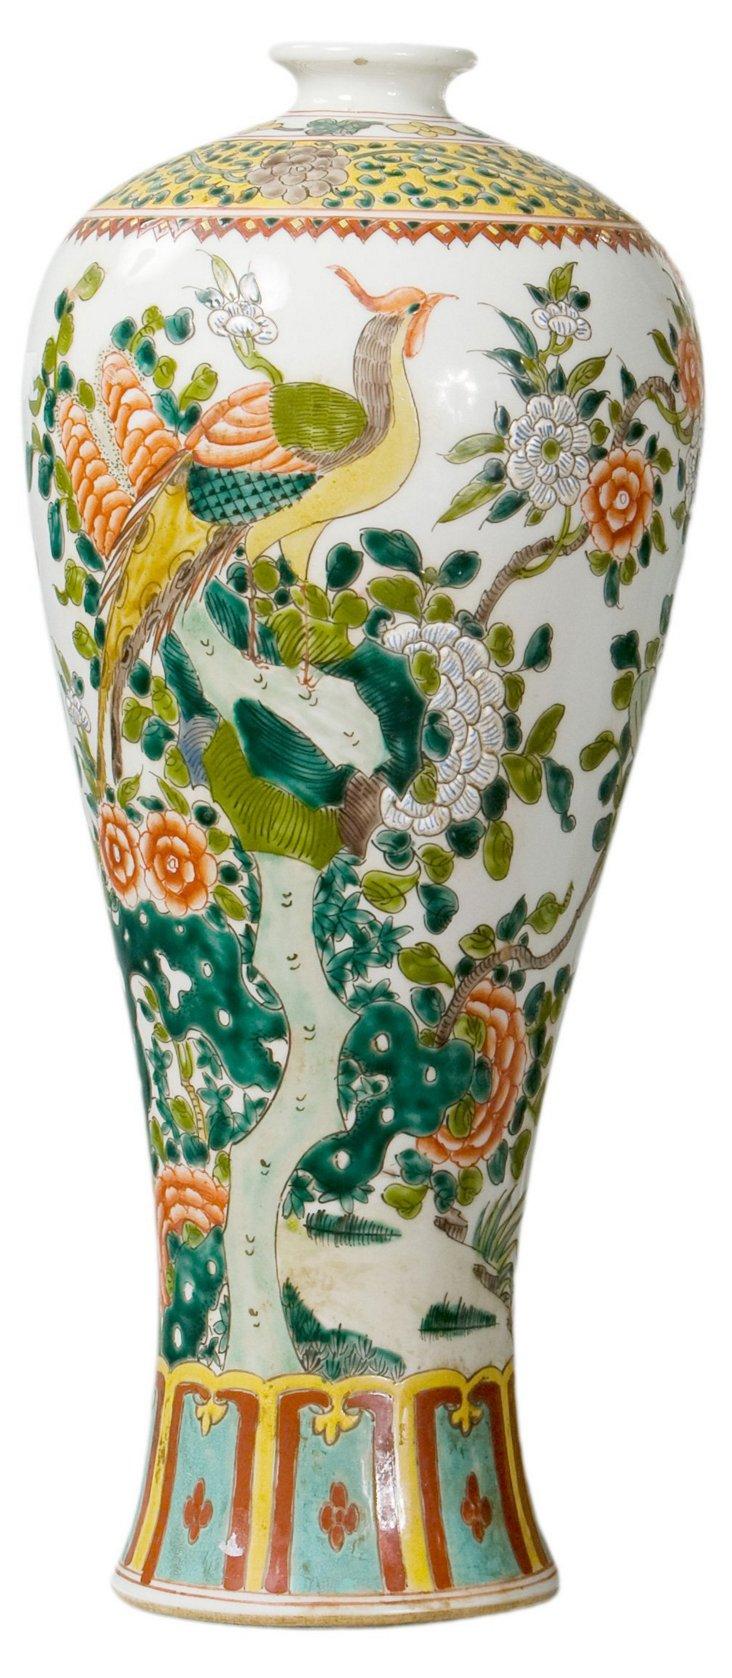 "17"" Porcelain Peacock Vase"